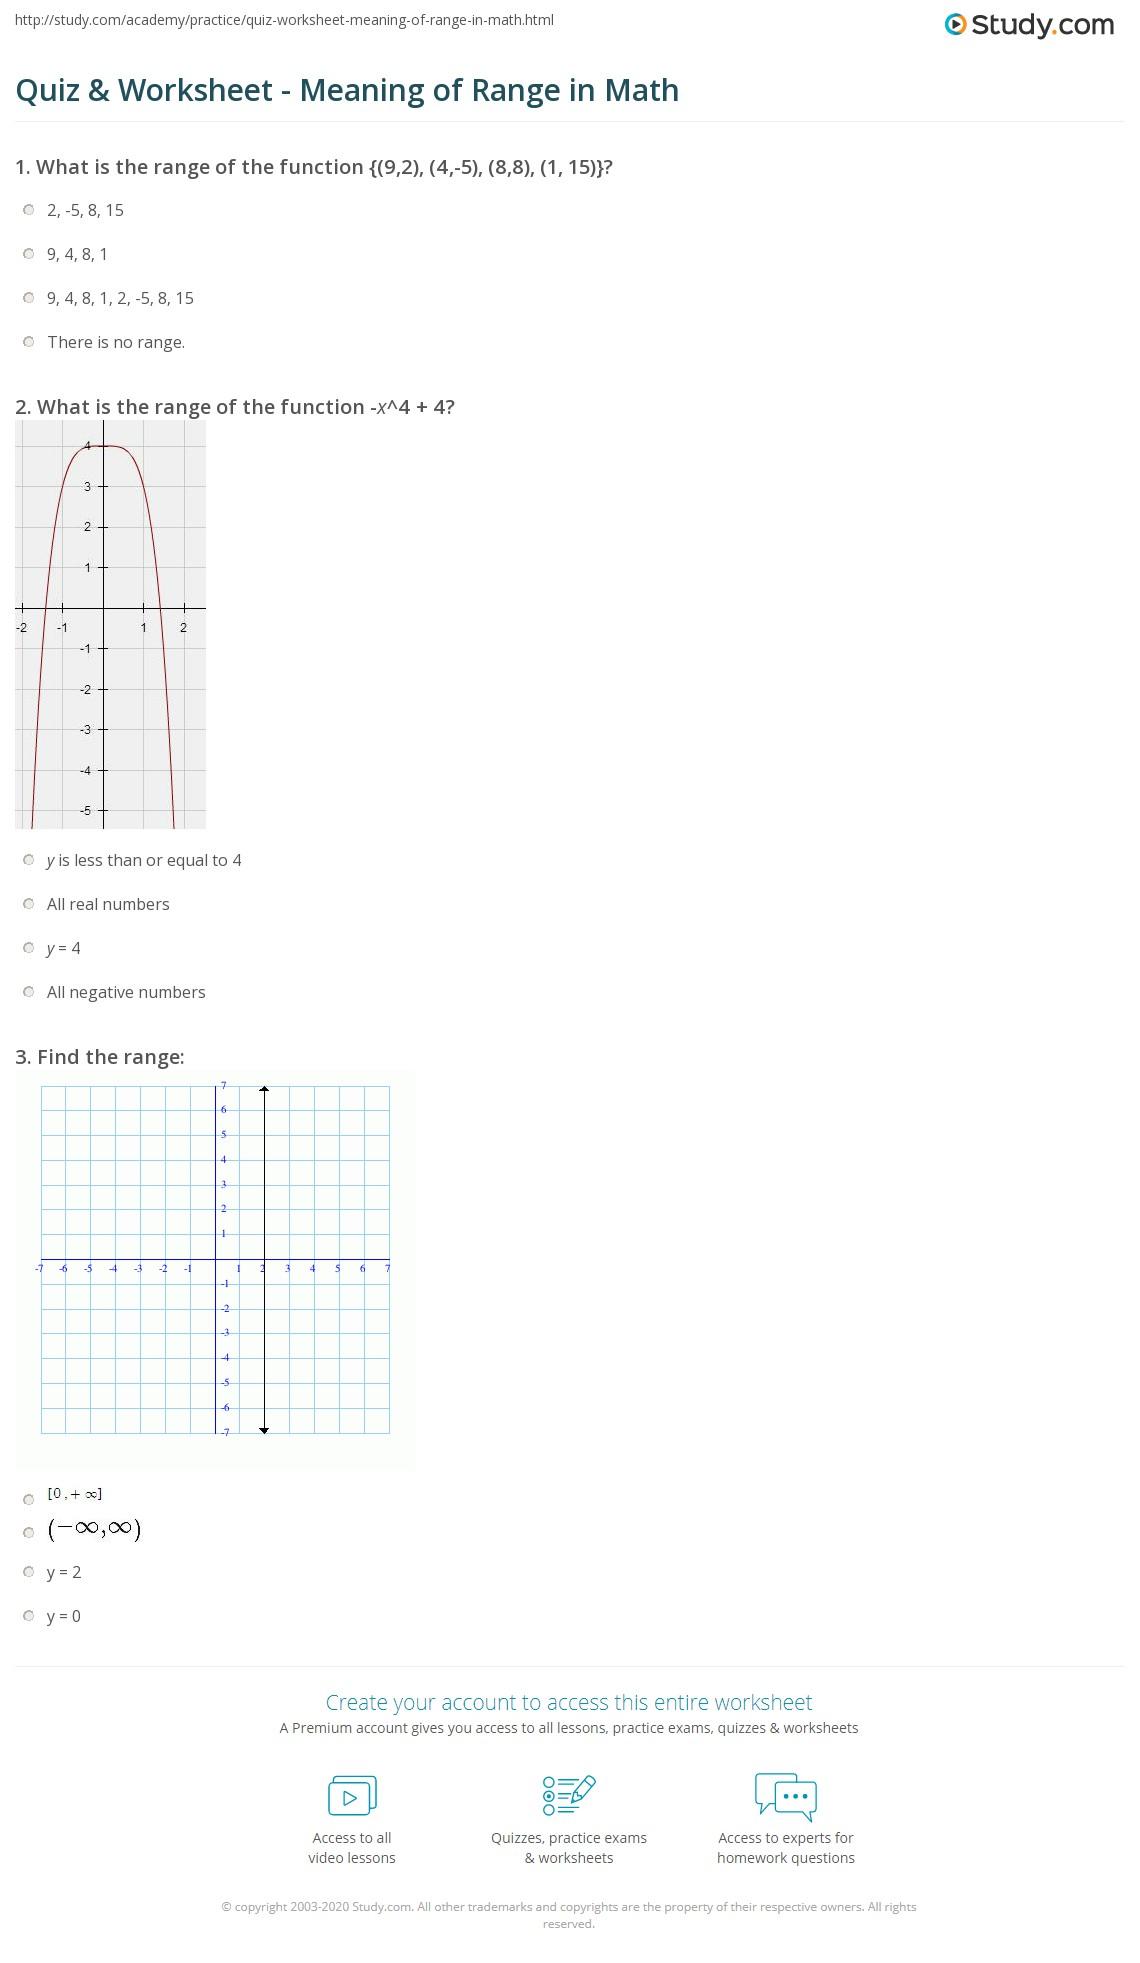 worksheet Range In Math quiz worksheet meaning of range in math study com print what is definition worksheet